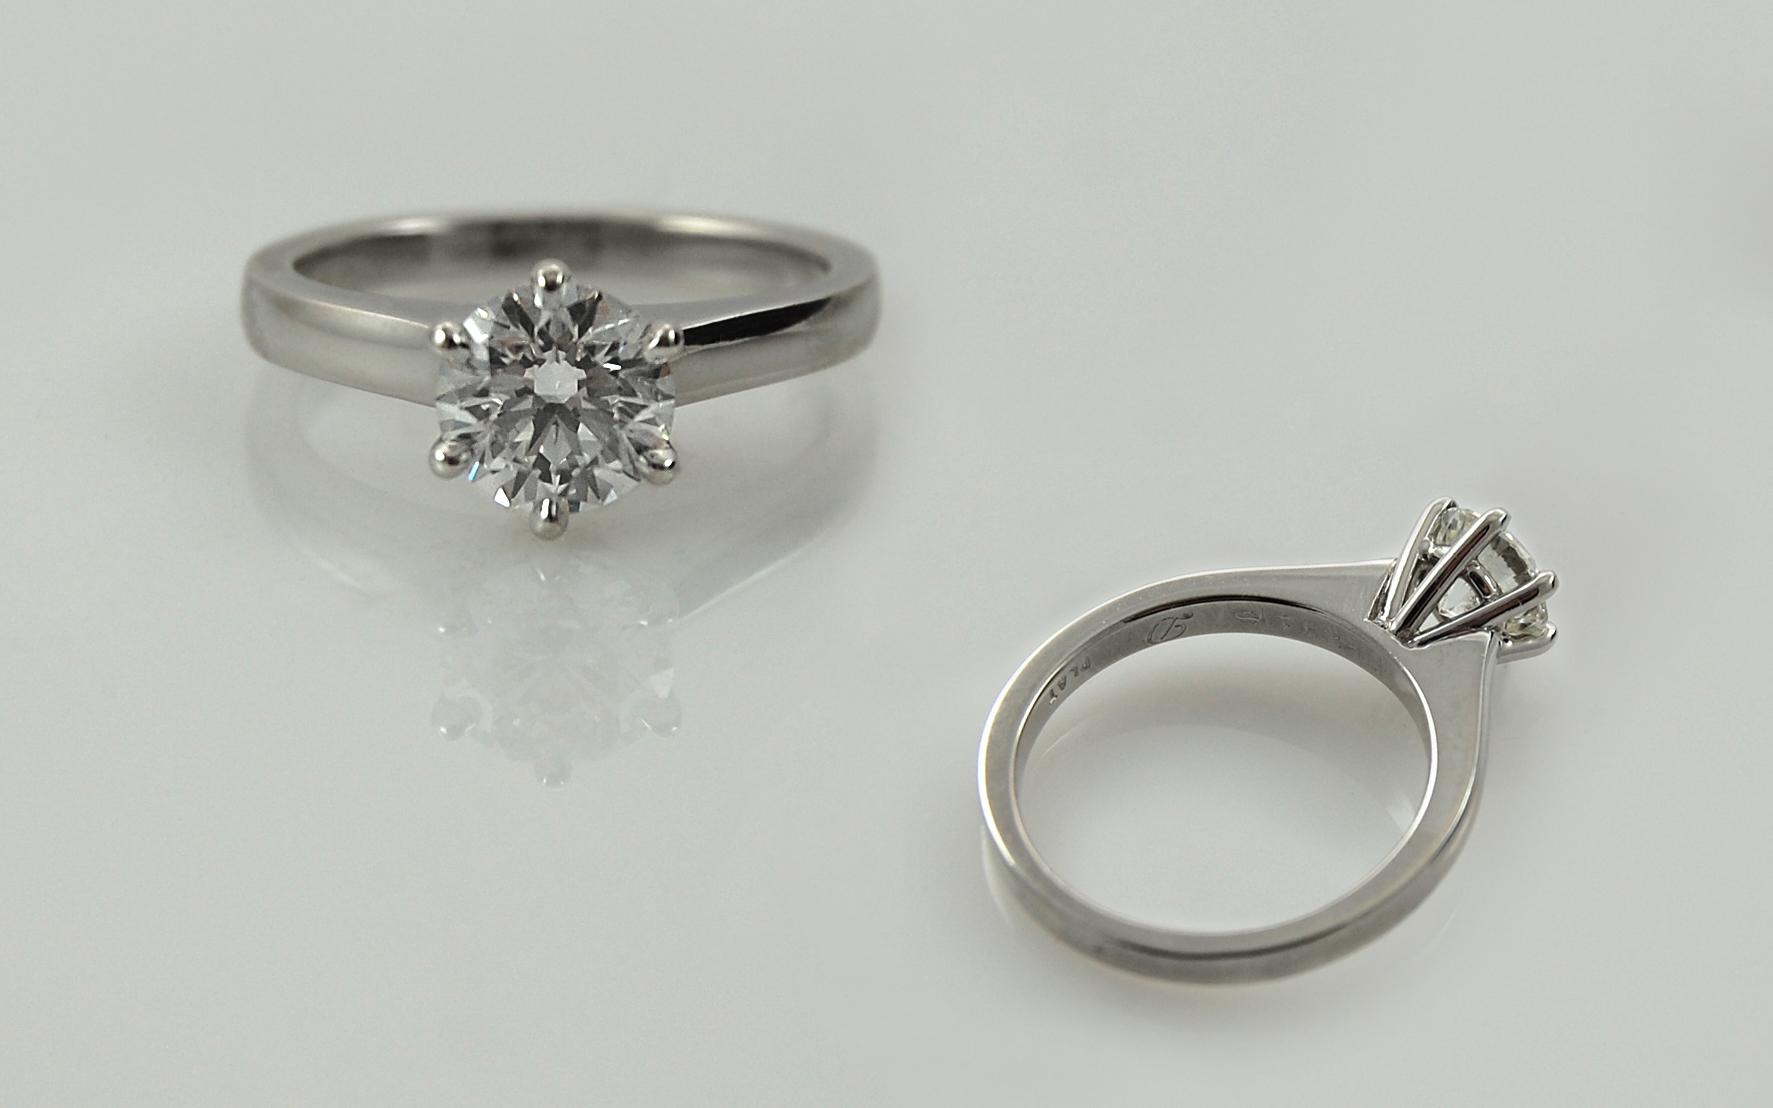 1.25 carat Diamond Solitaire